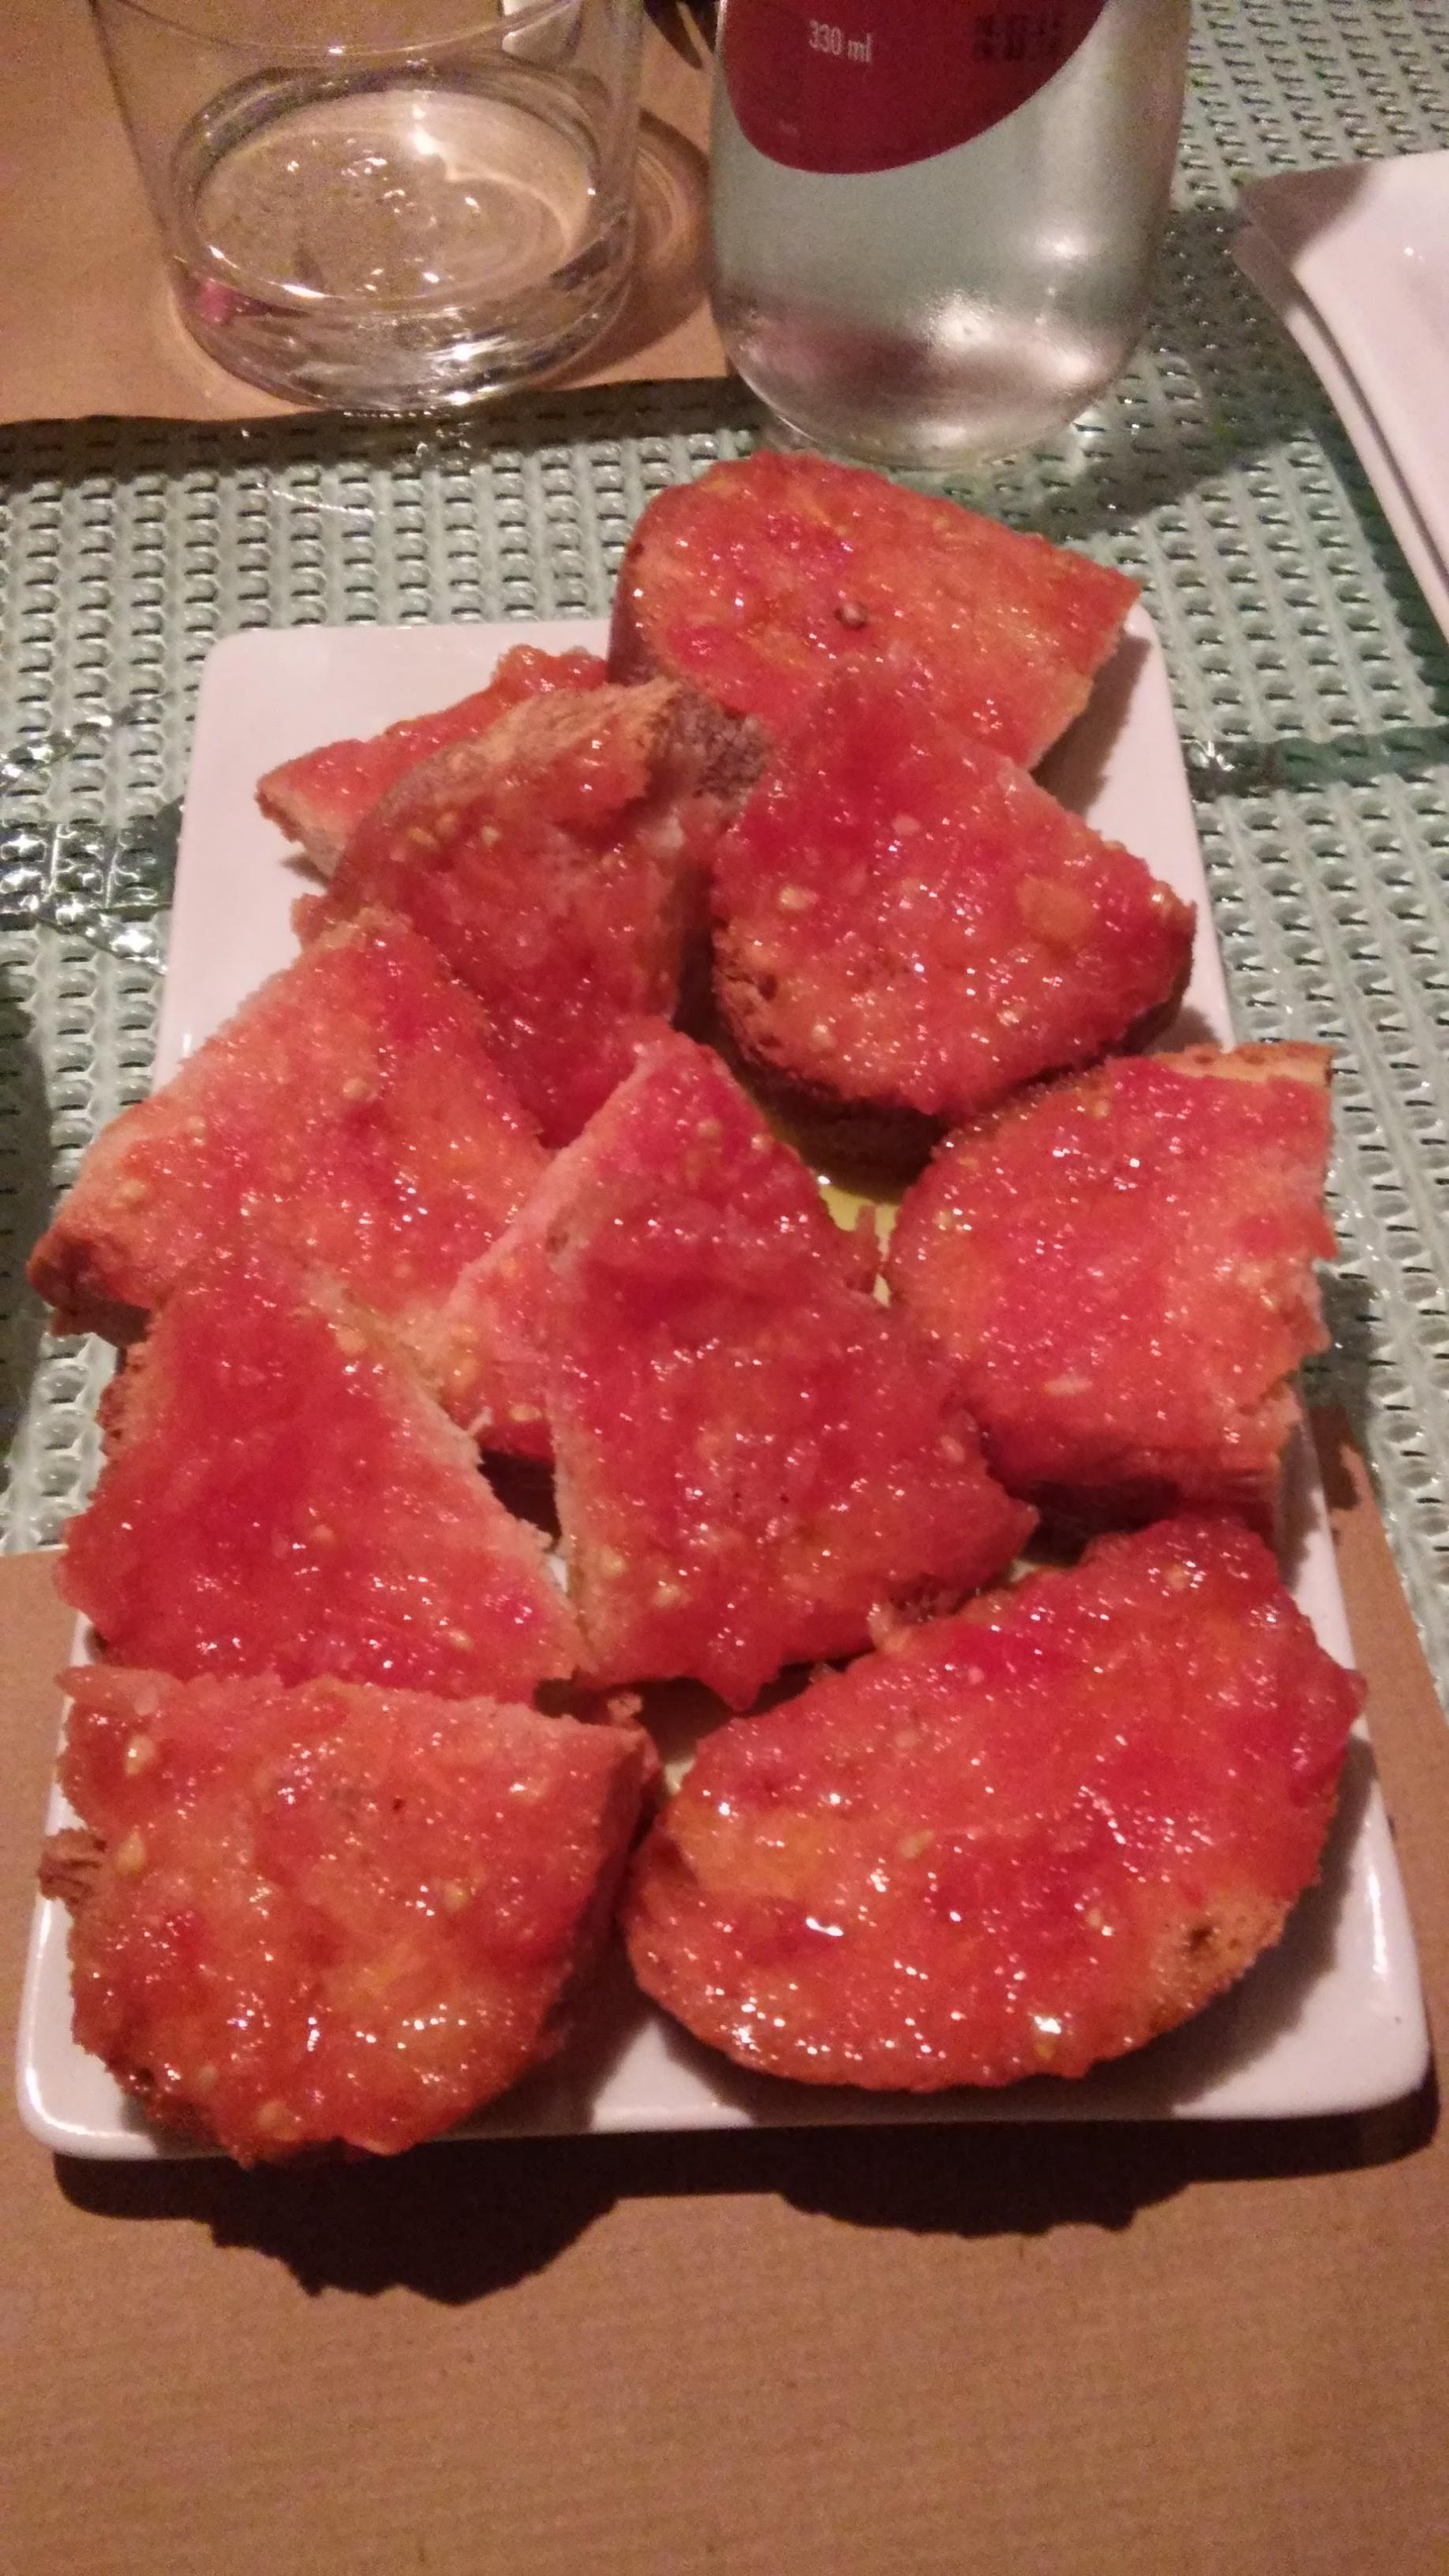 Bread with tomato